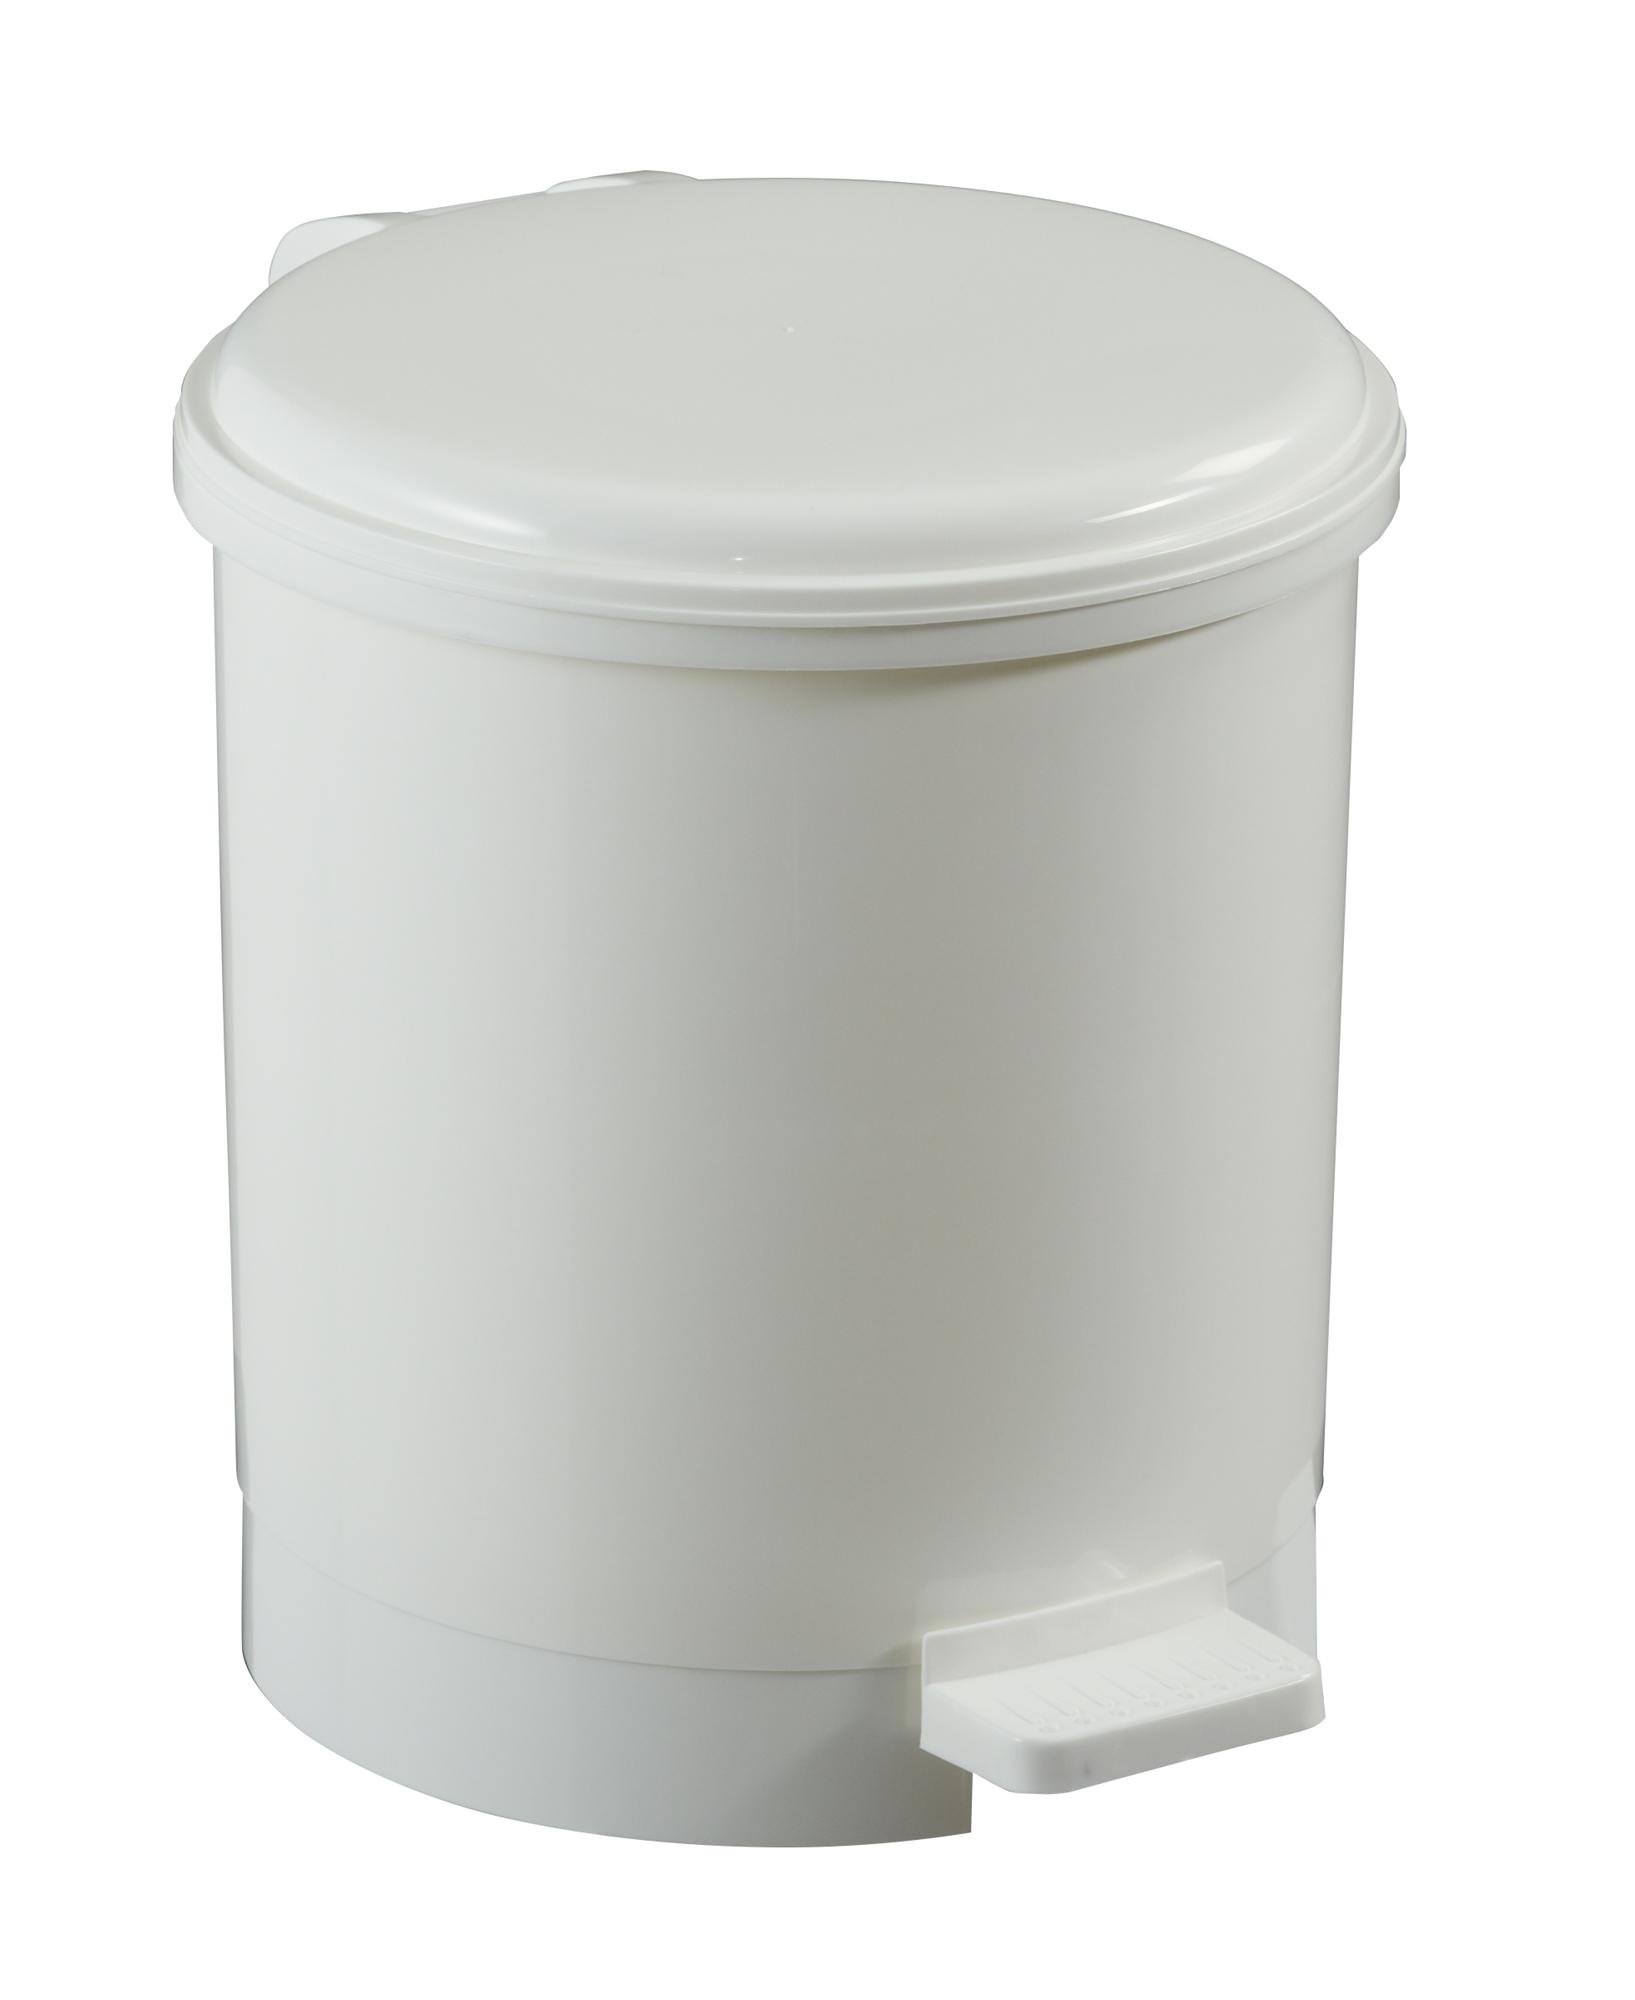 poubelle a pedale plastique rossignol 6 litres. Black Bedroom Furniture Sets. Home Design Ideas